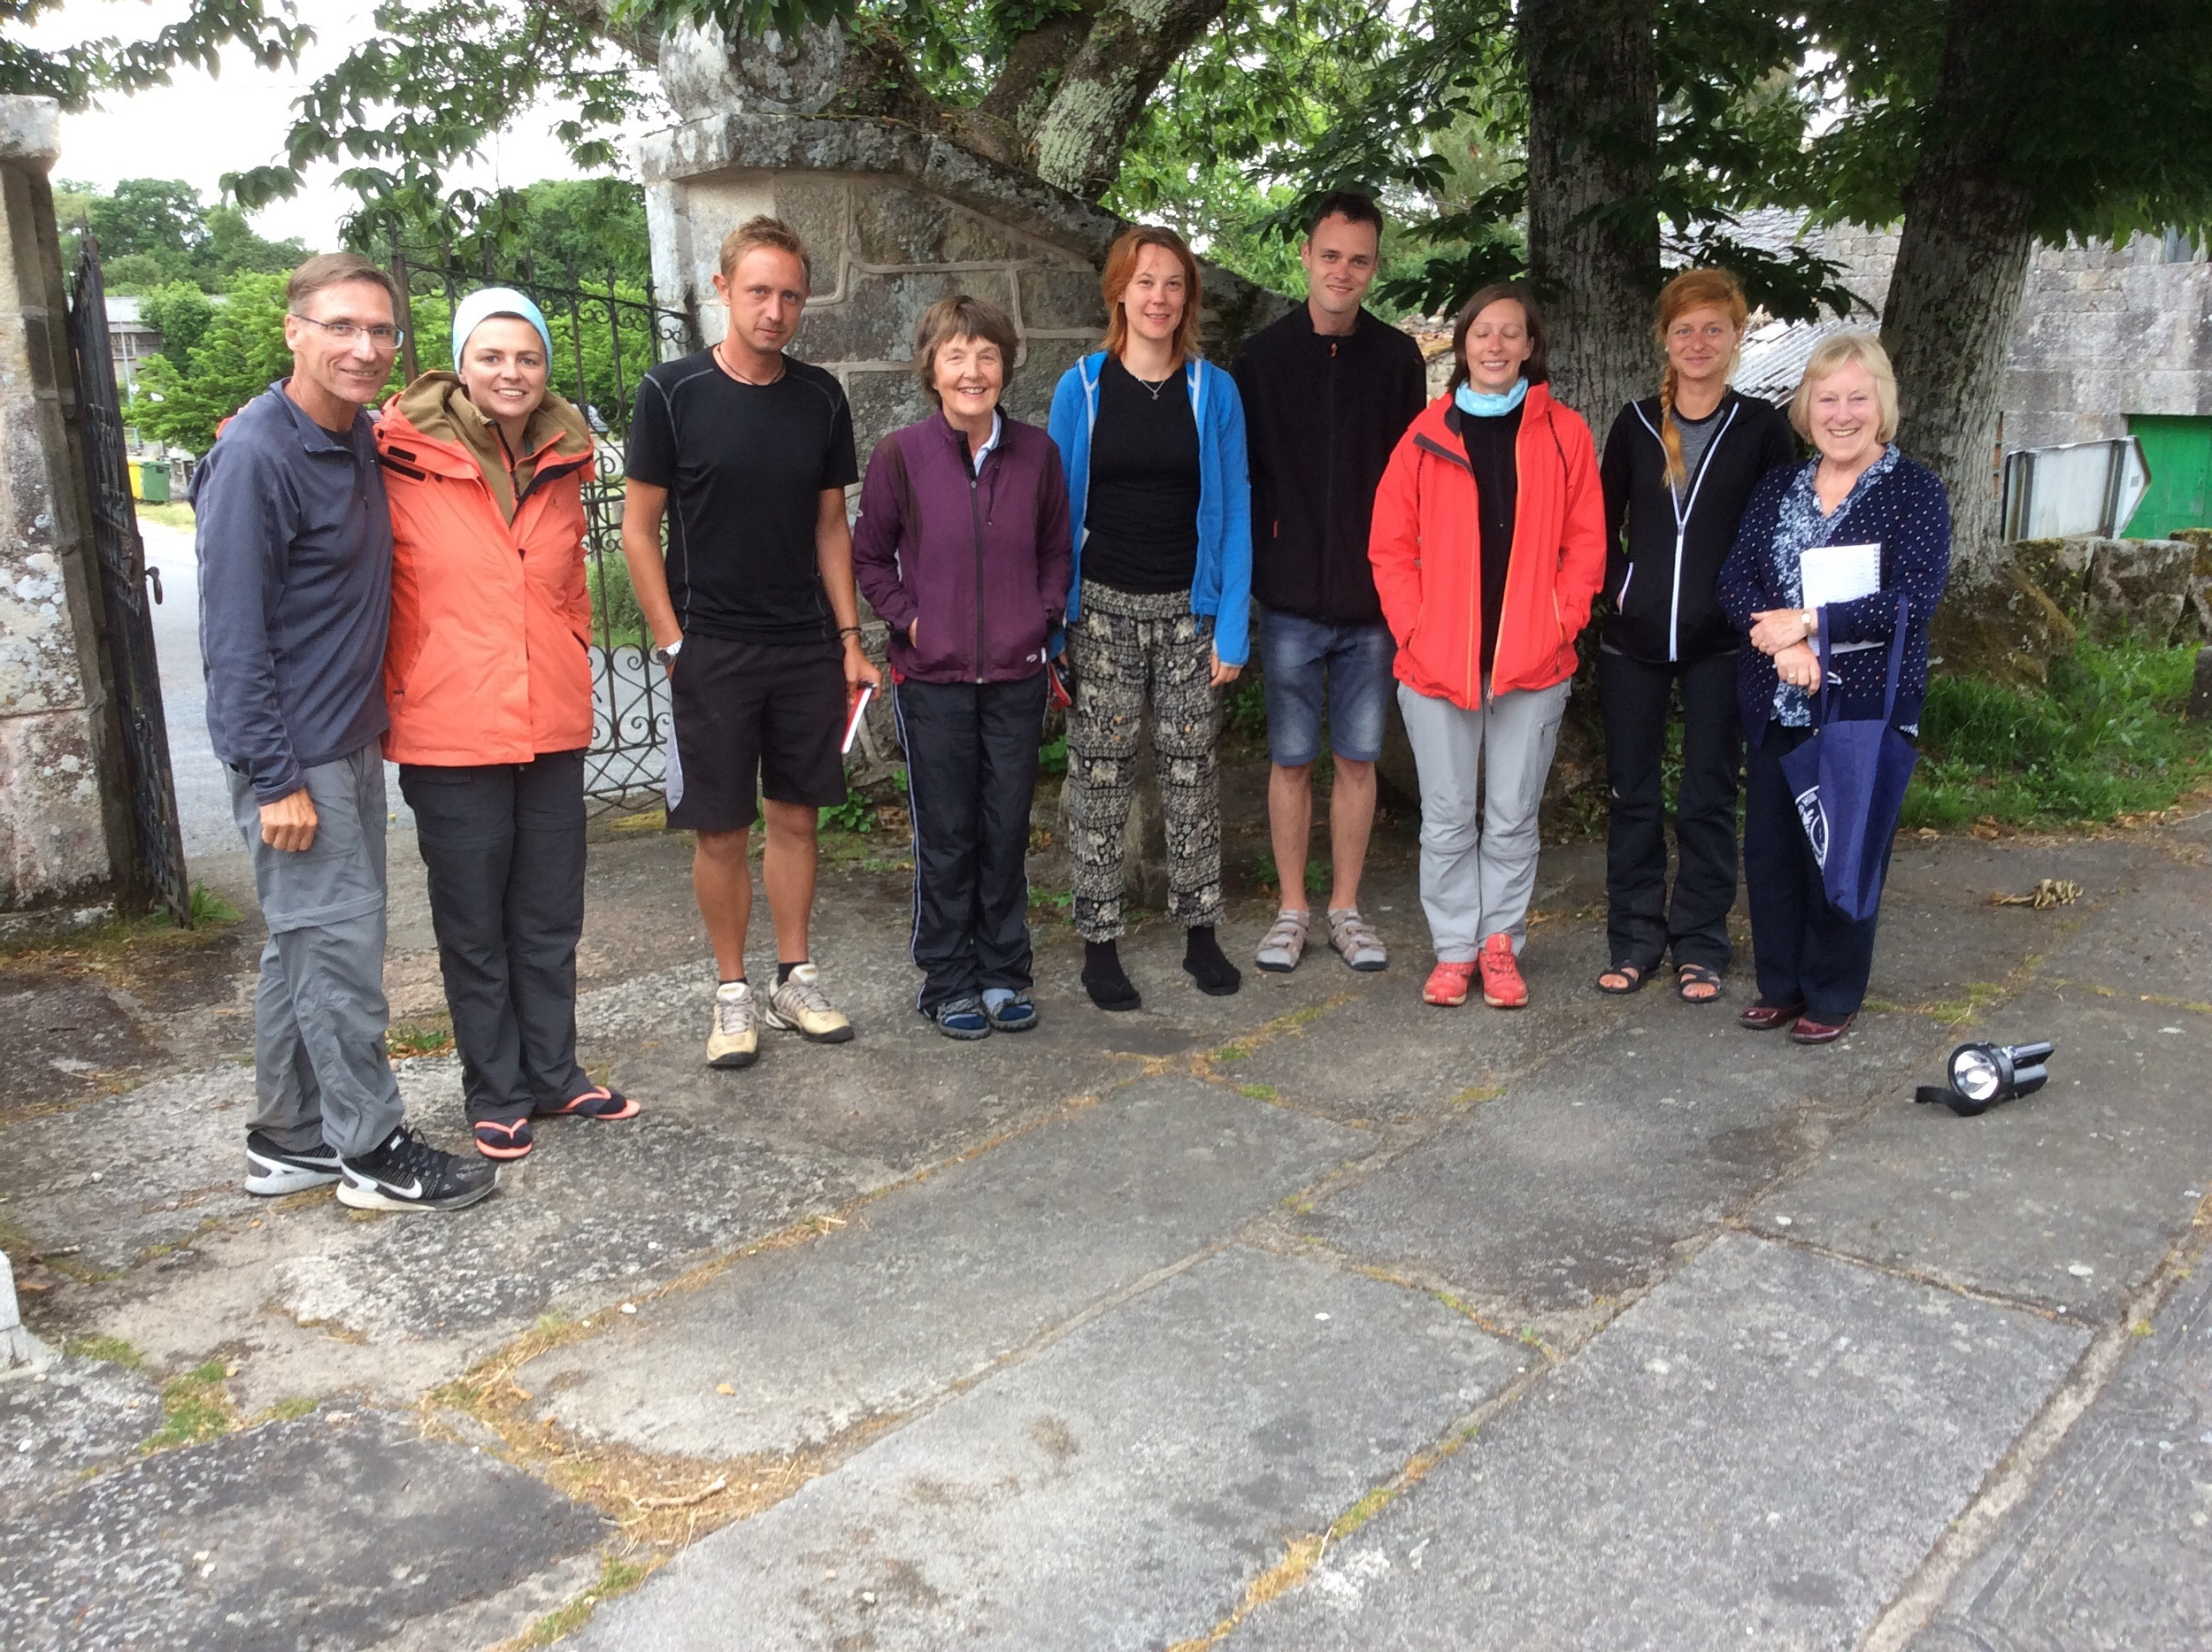 Hosts and peregrinos (pilgrims)